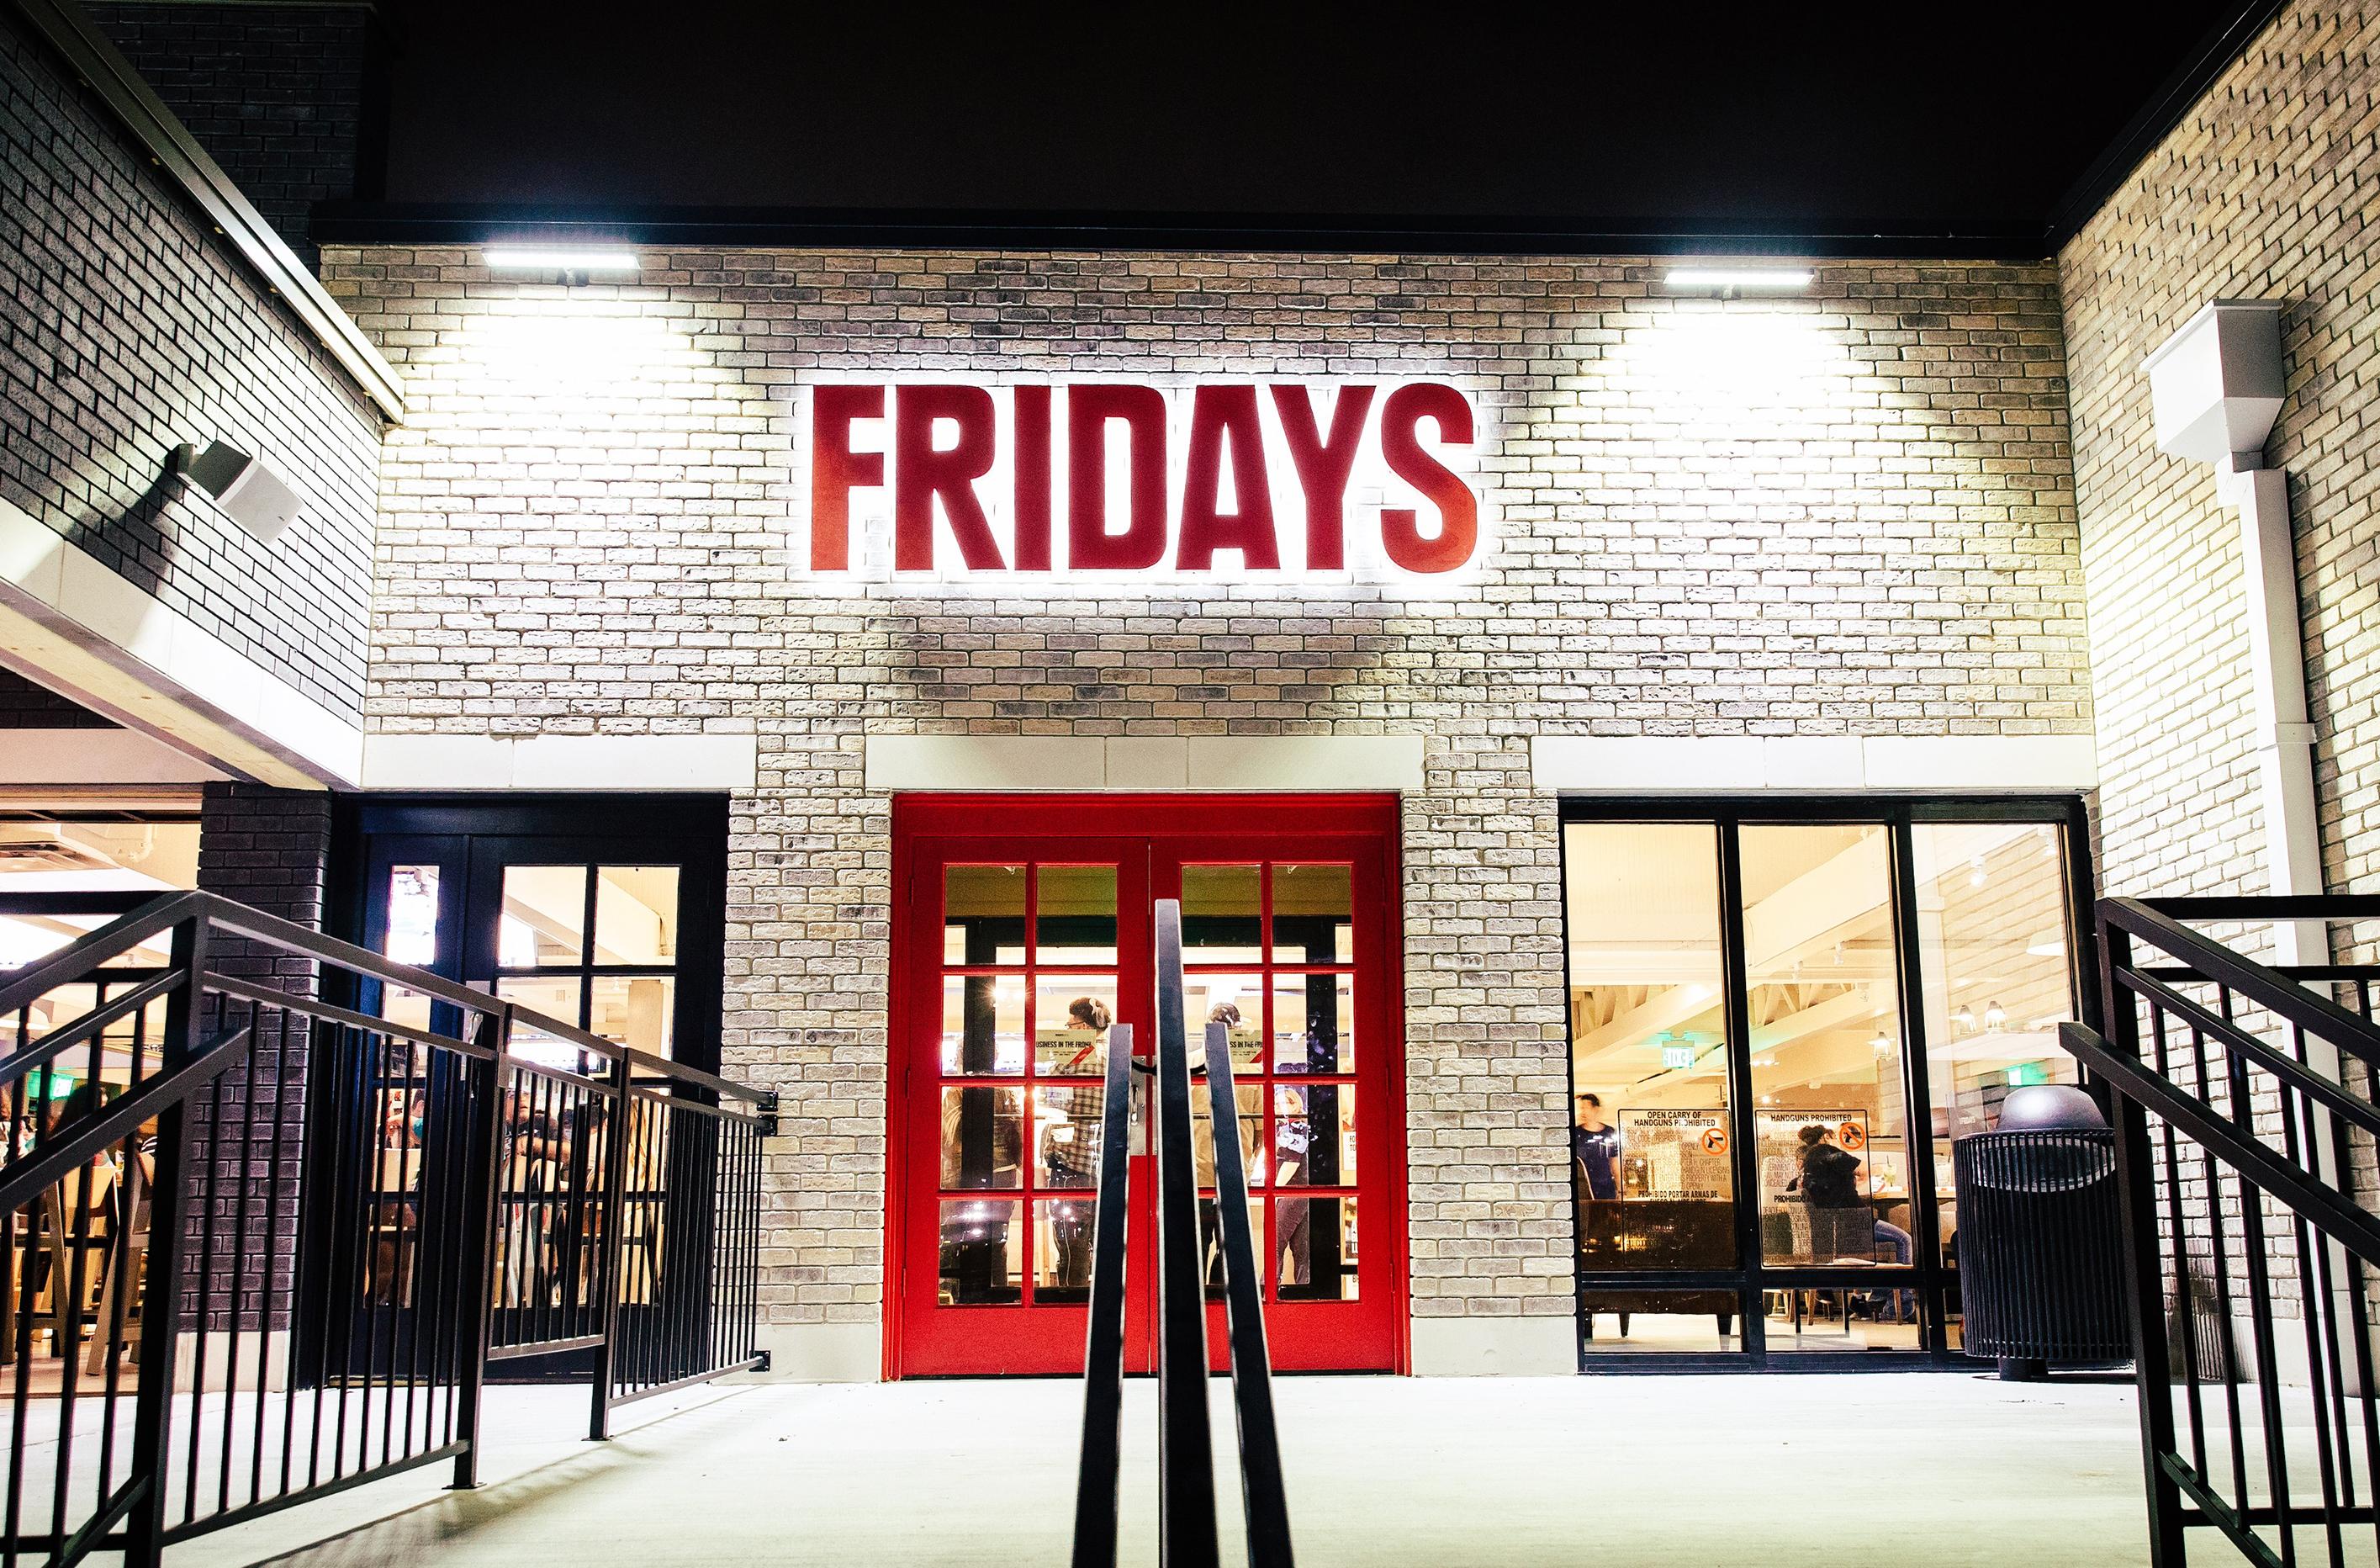 Fridays Exterior